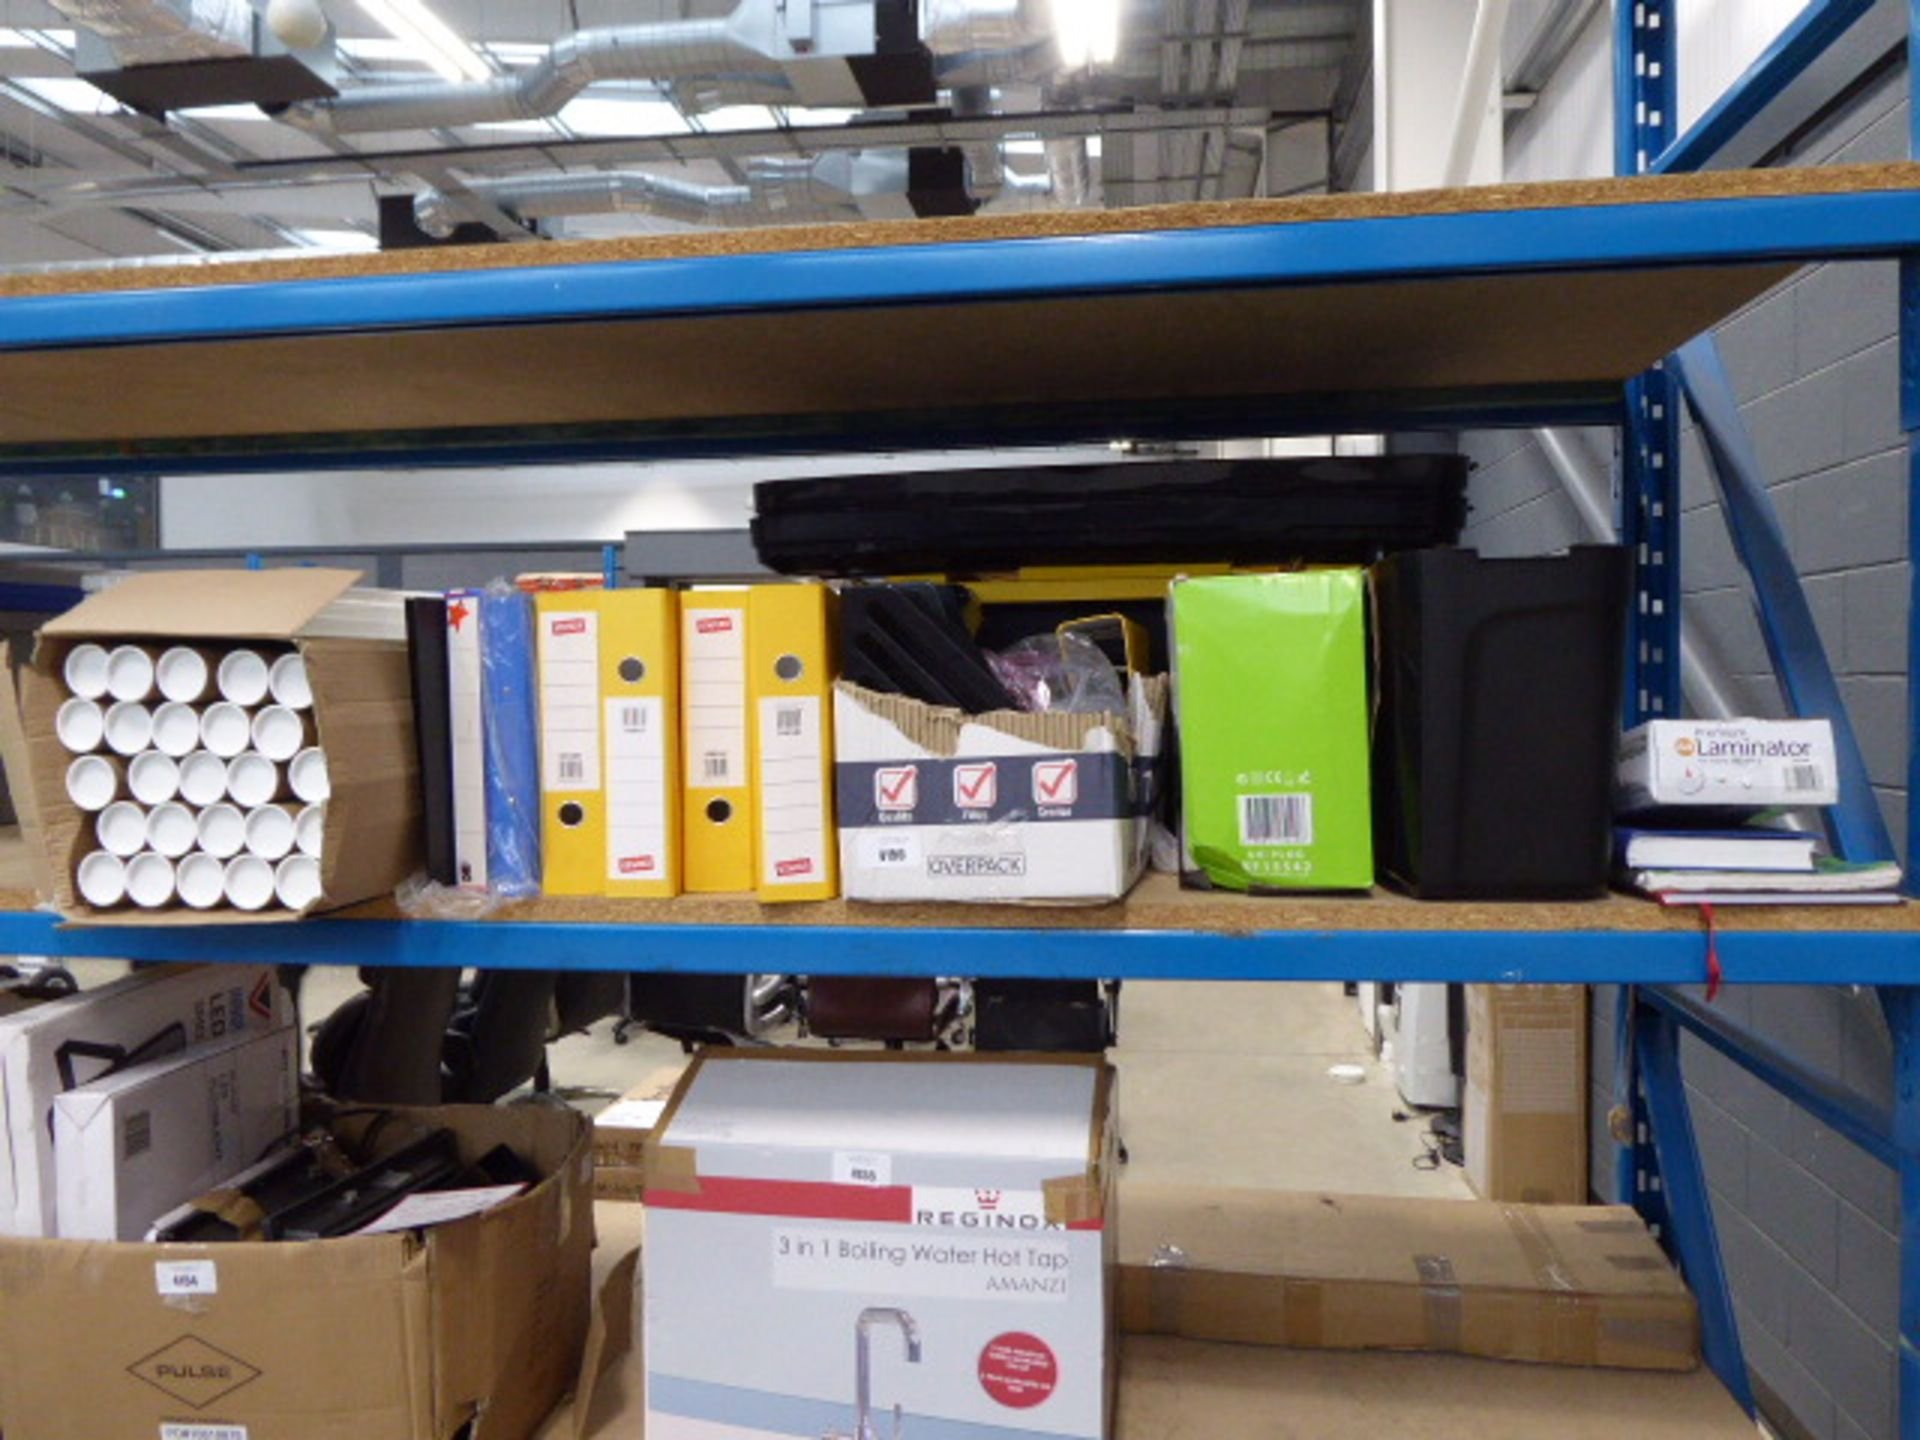 Half shelf of assorted stationary